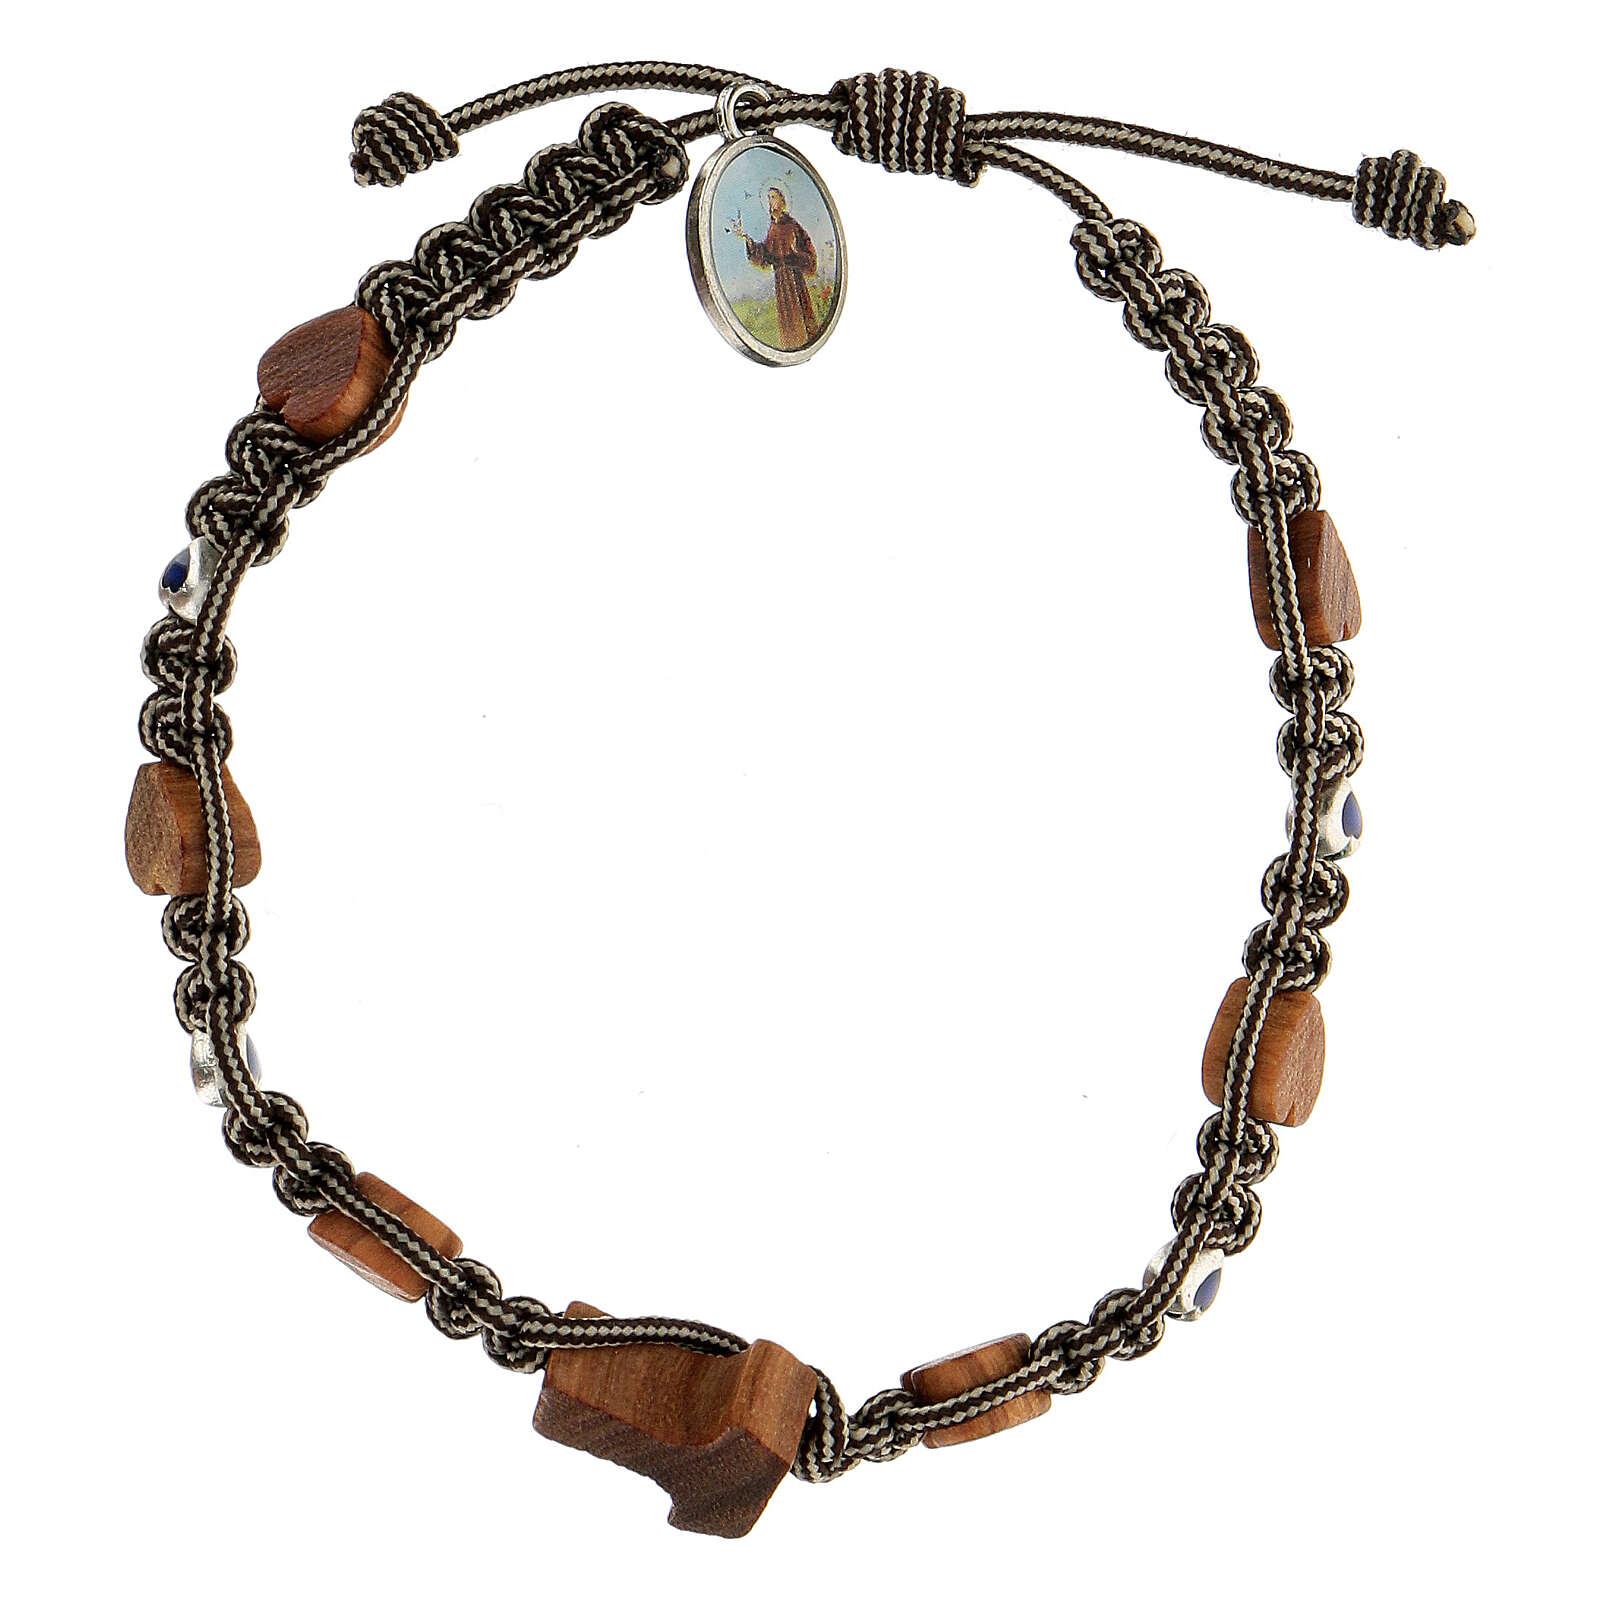 Bracelet Medjugorje tau coeurs corde bicolore blanc noir 4